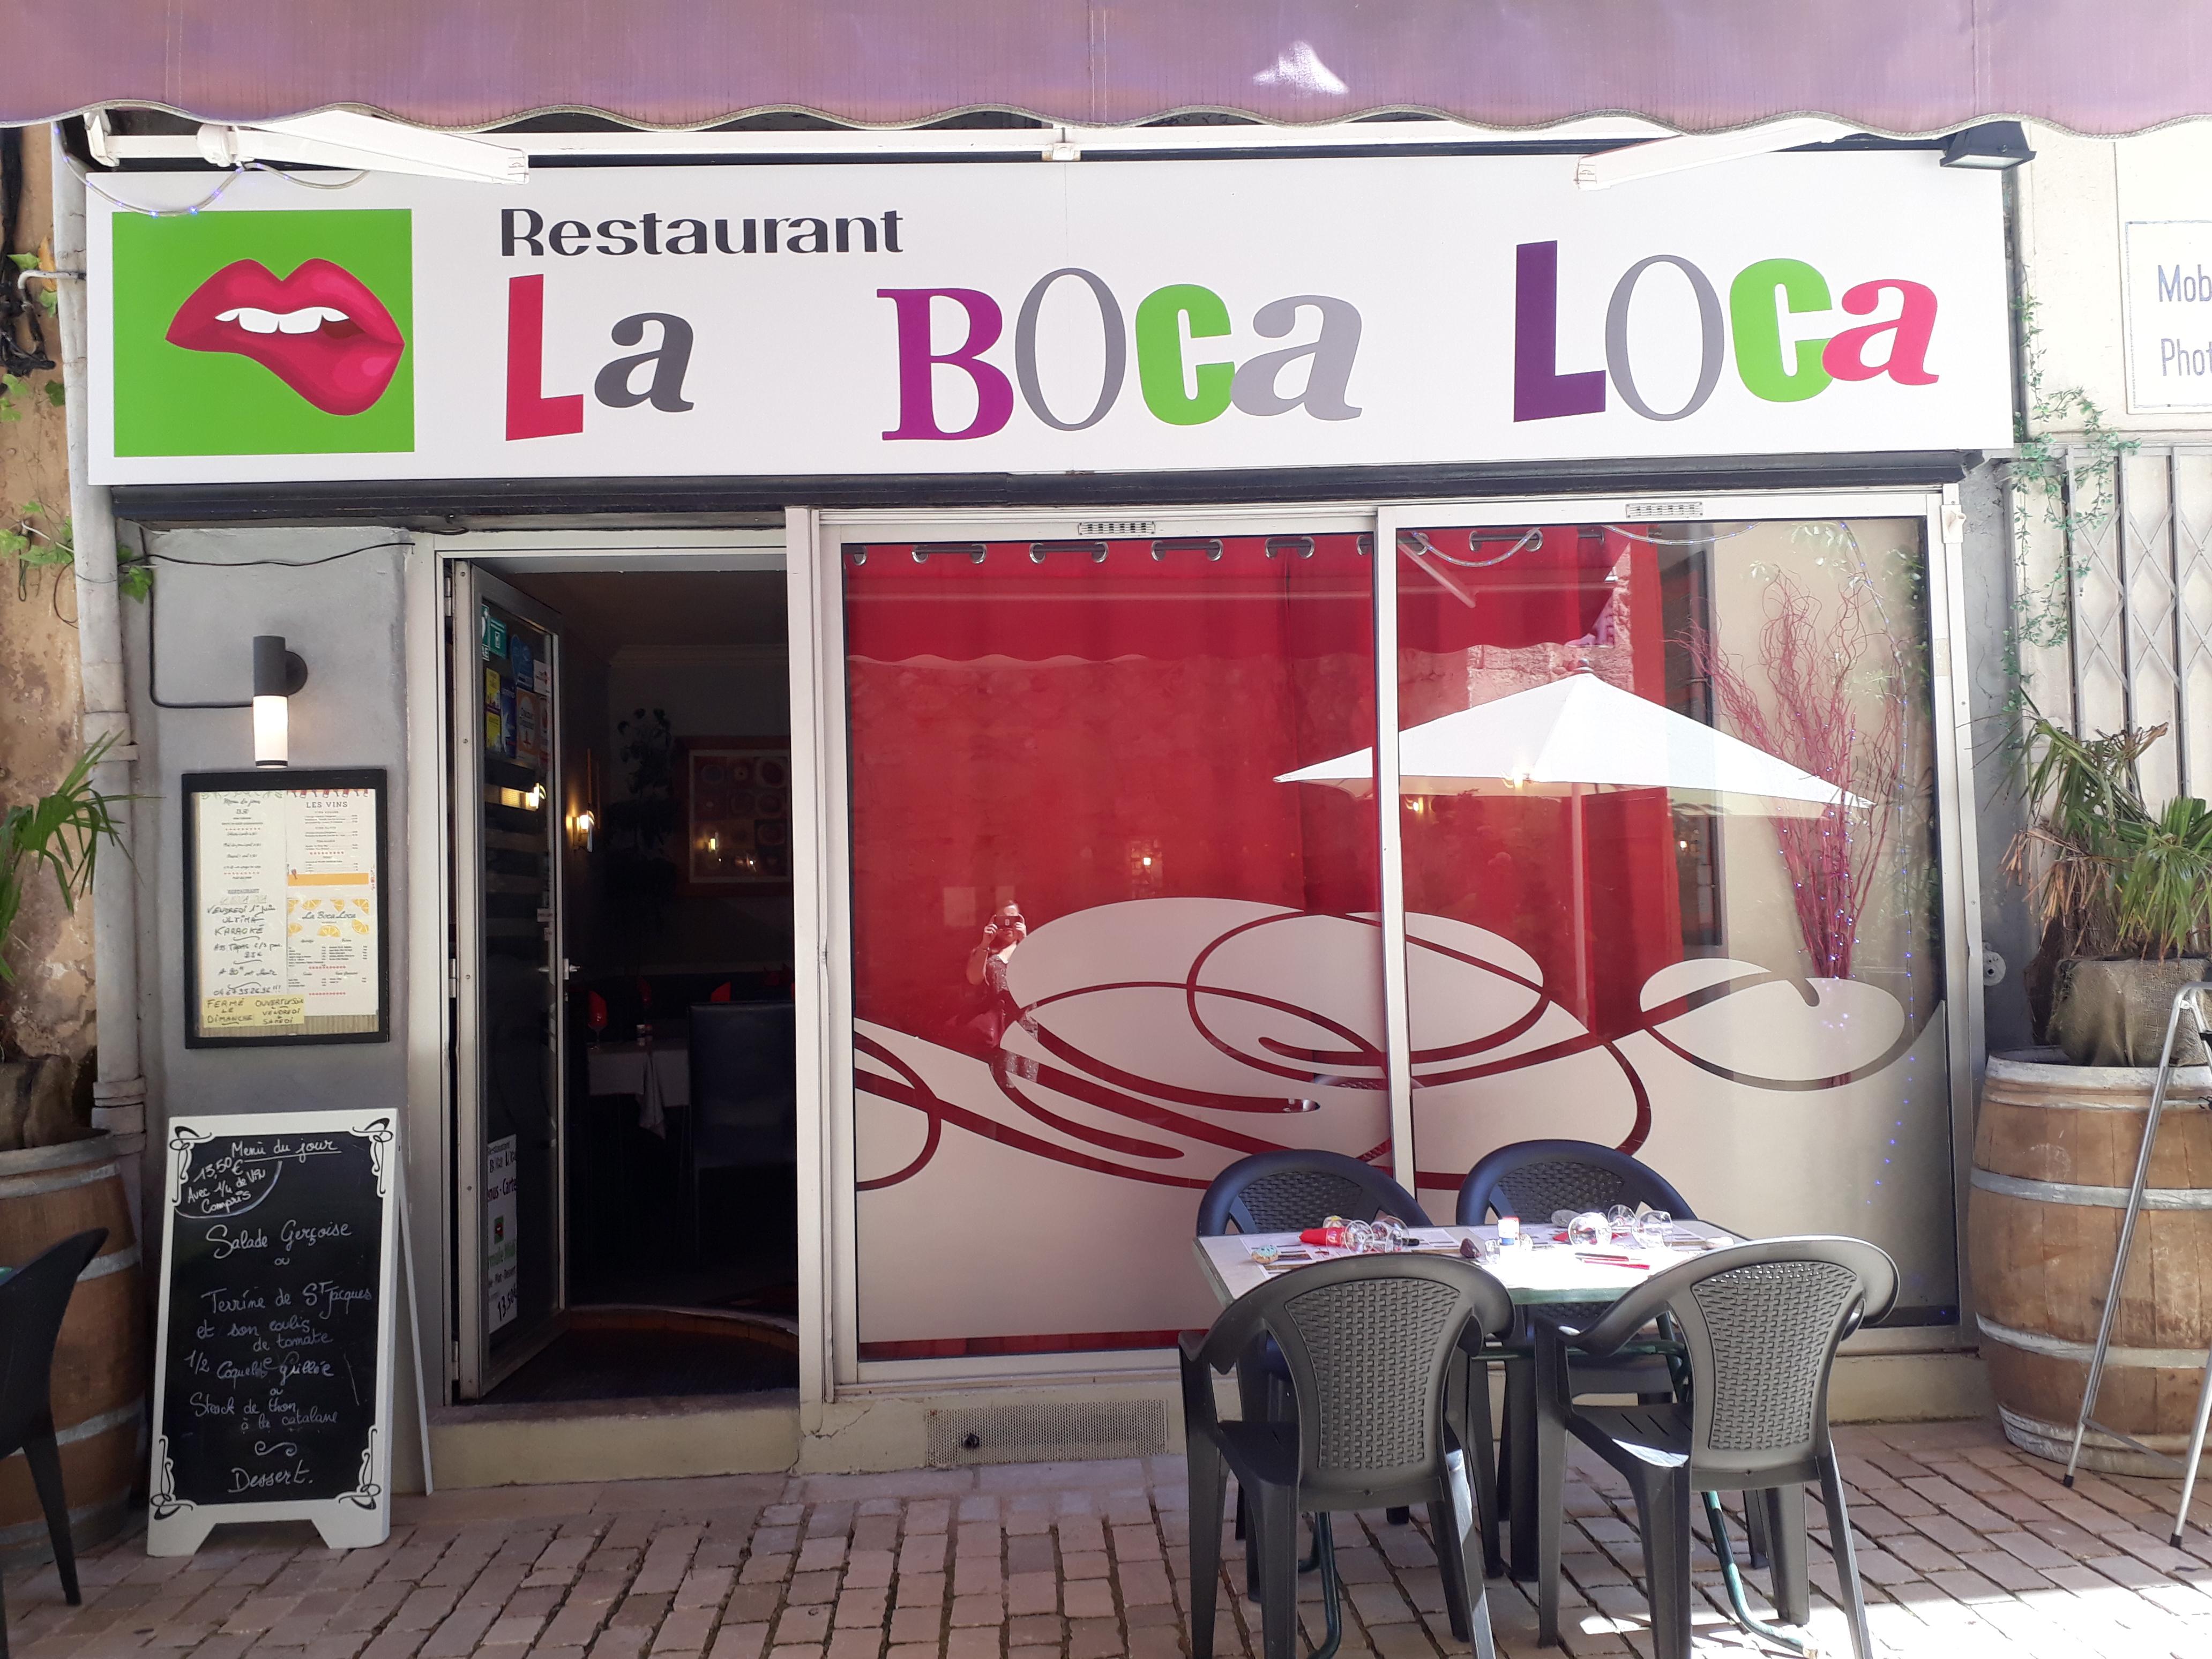 LA BOCA LOCA - LA-BOCA-LOCA-BEDARIEUX - Crédit : Office de Tourisme Bédarieux Grand Orb